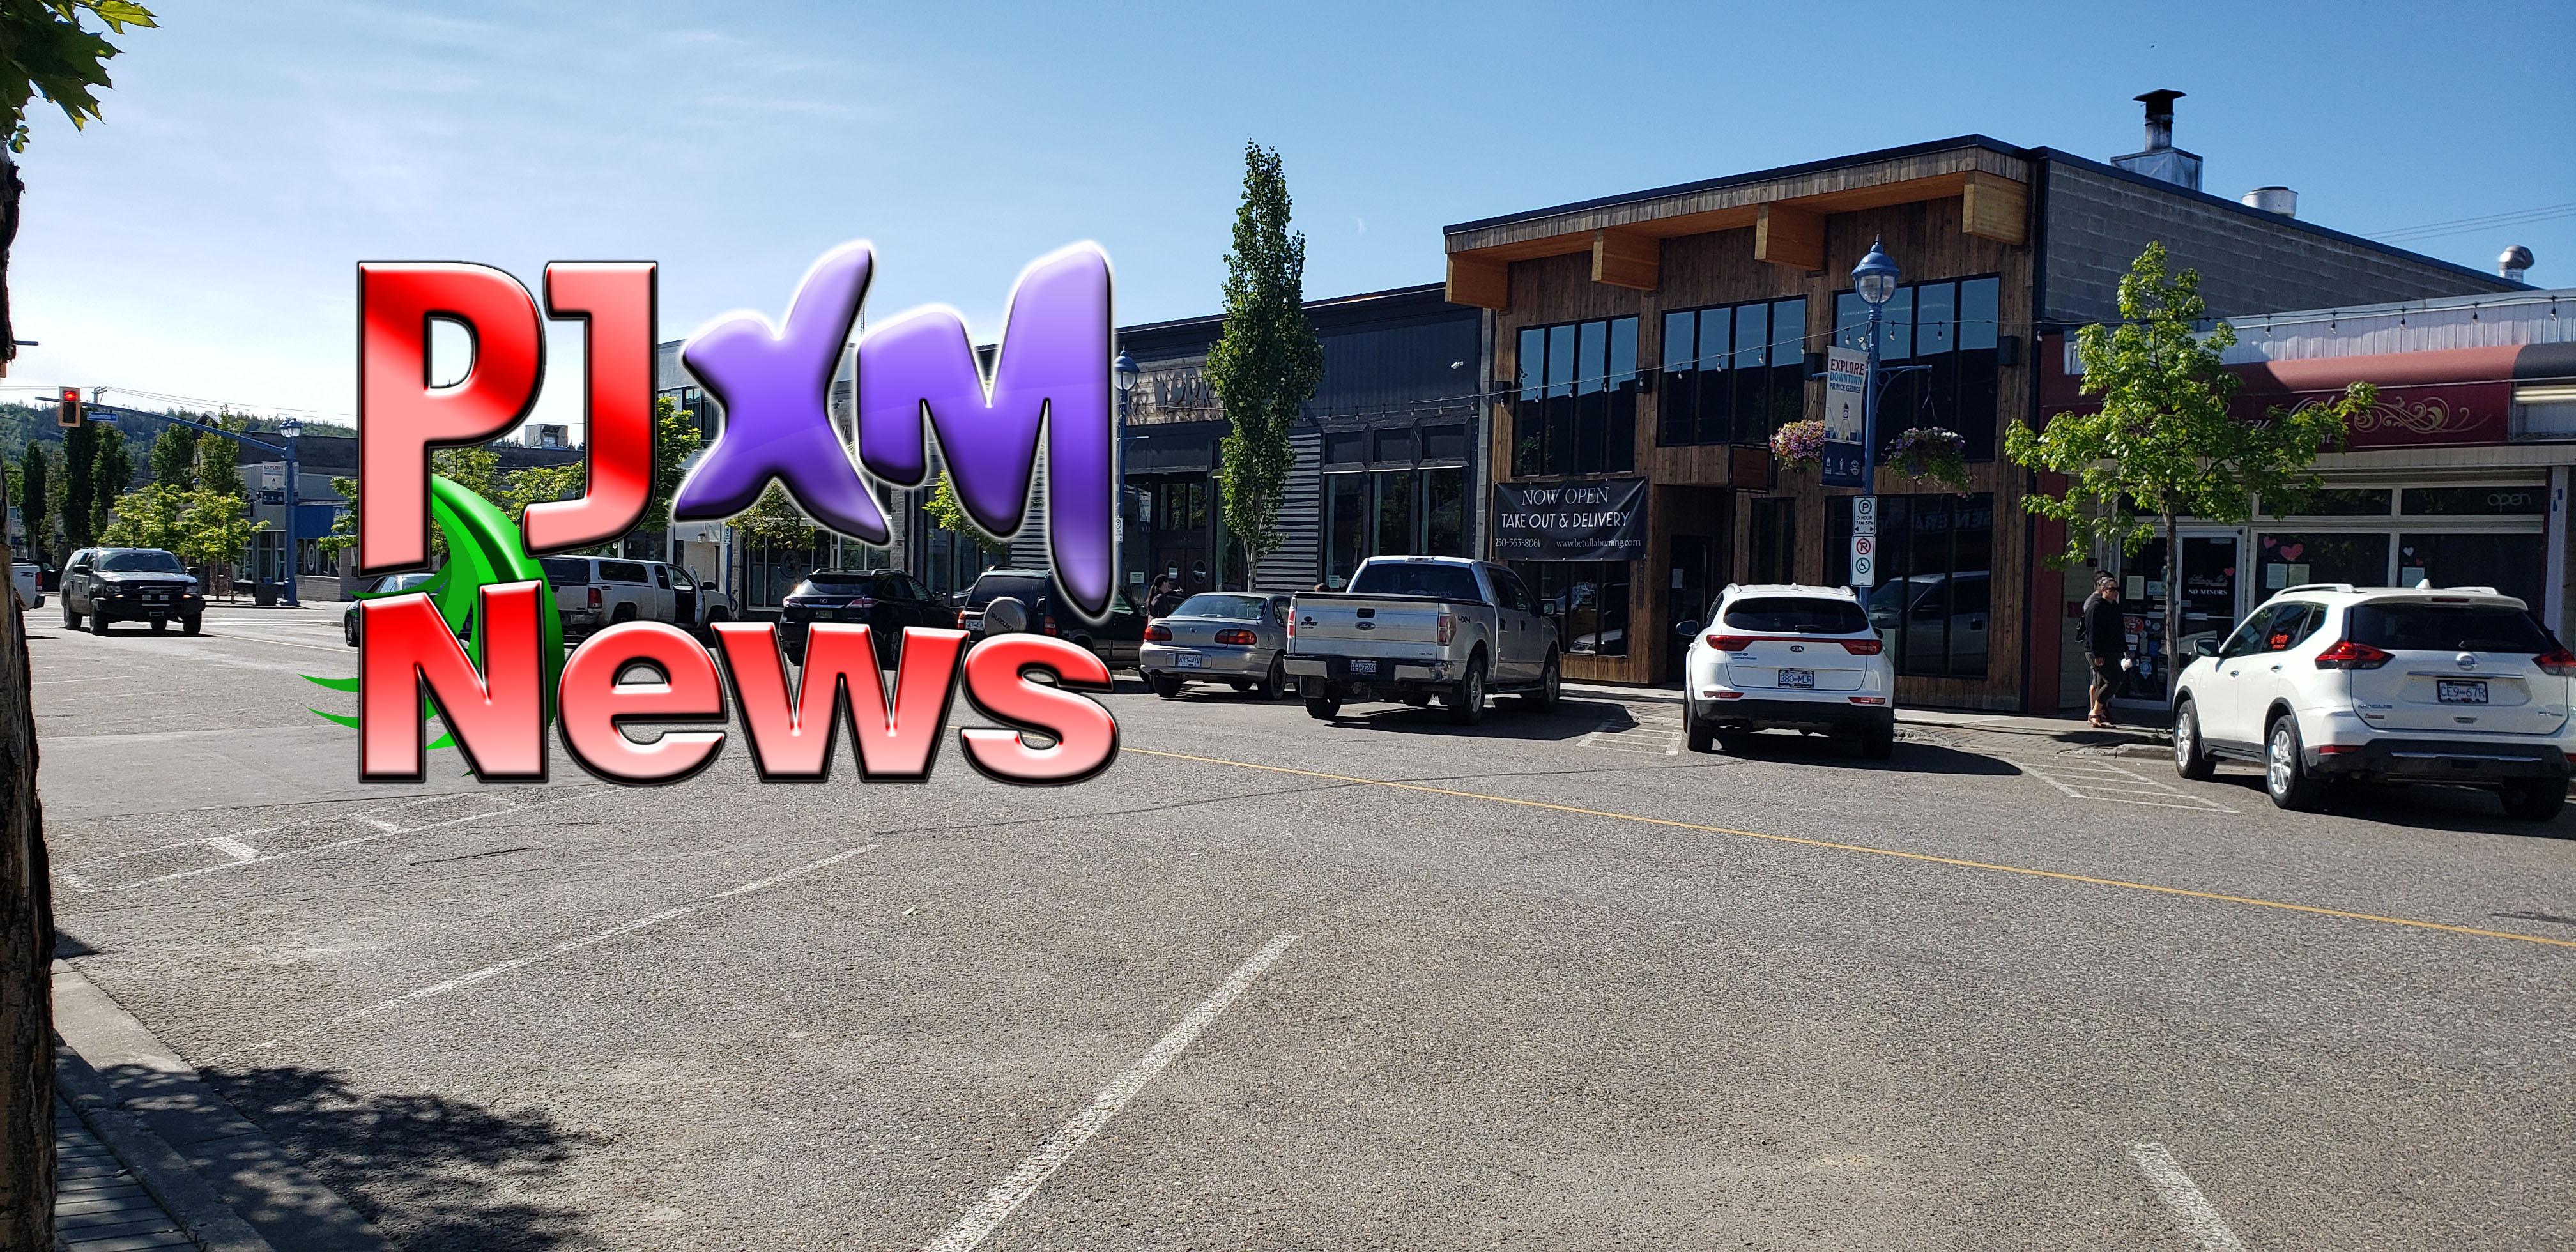 PJXM News